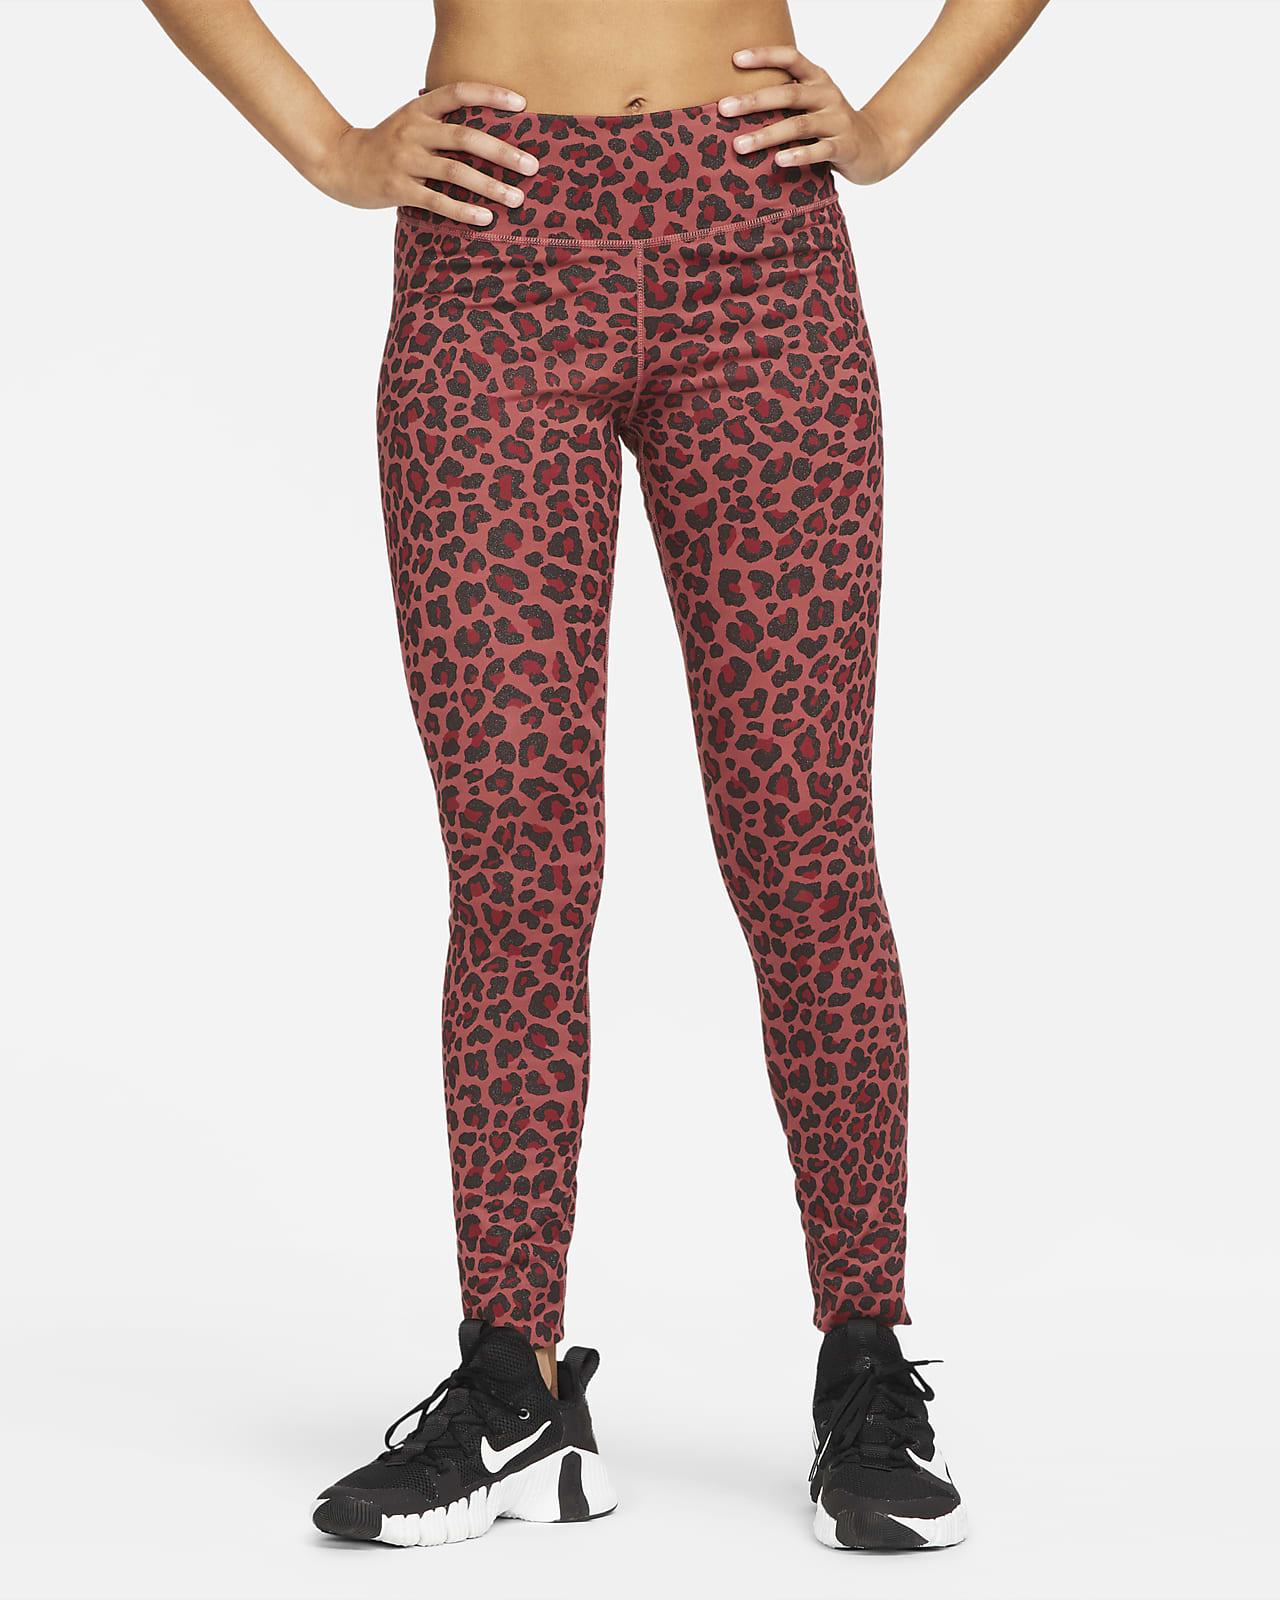 Nike Dri-FIT One Women's Mid-Rise Printed Leggings